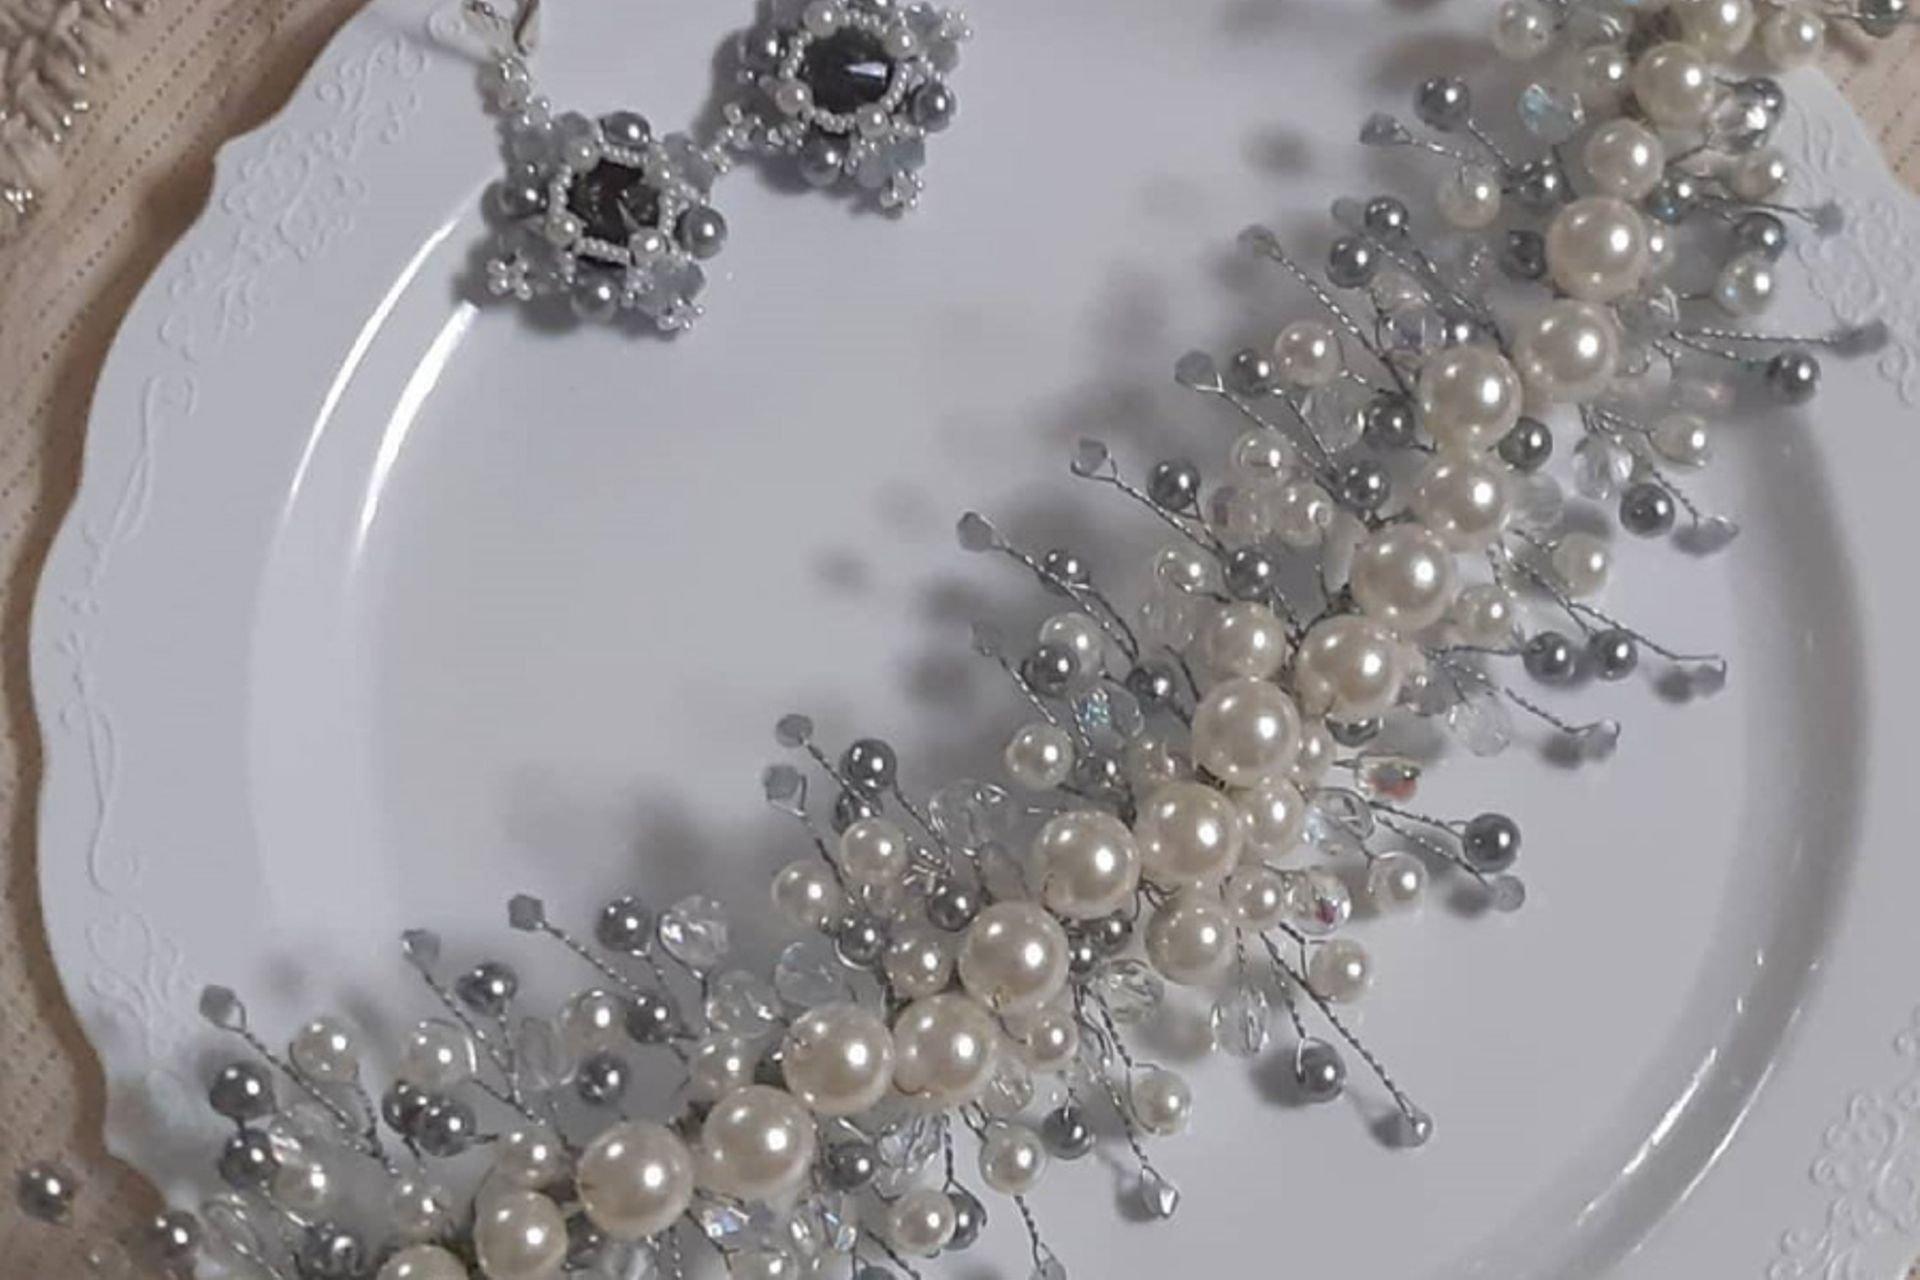 40 lantana beads jewelry designer תְמוּנָה